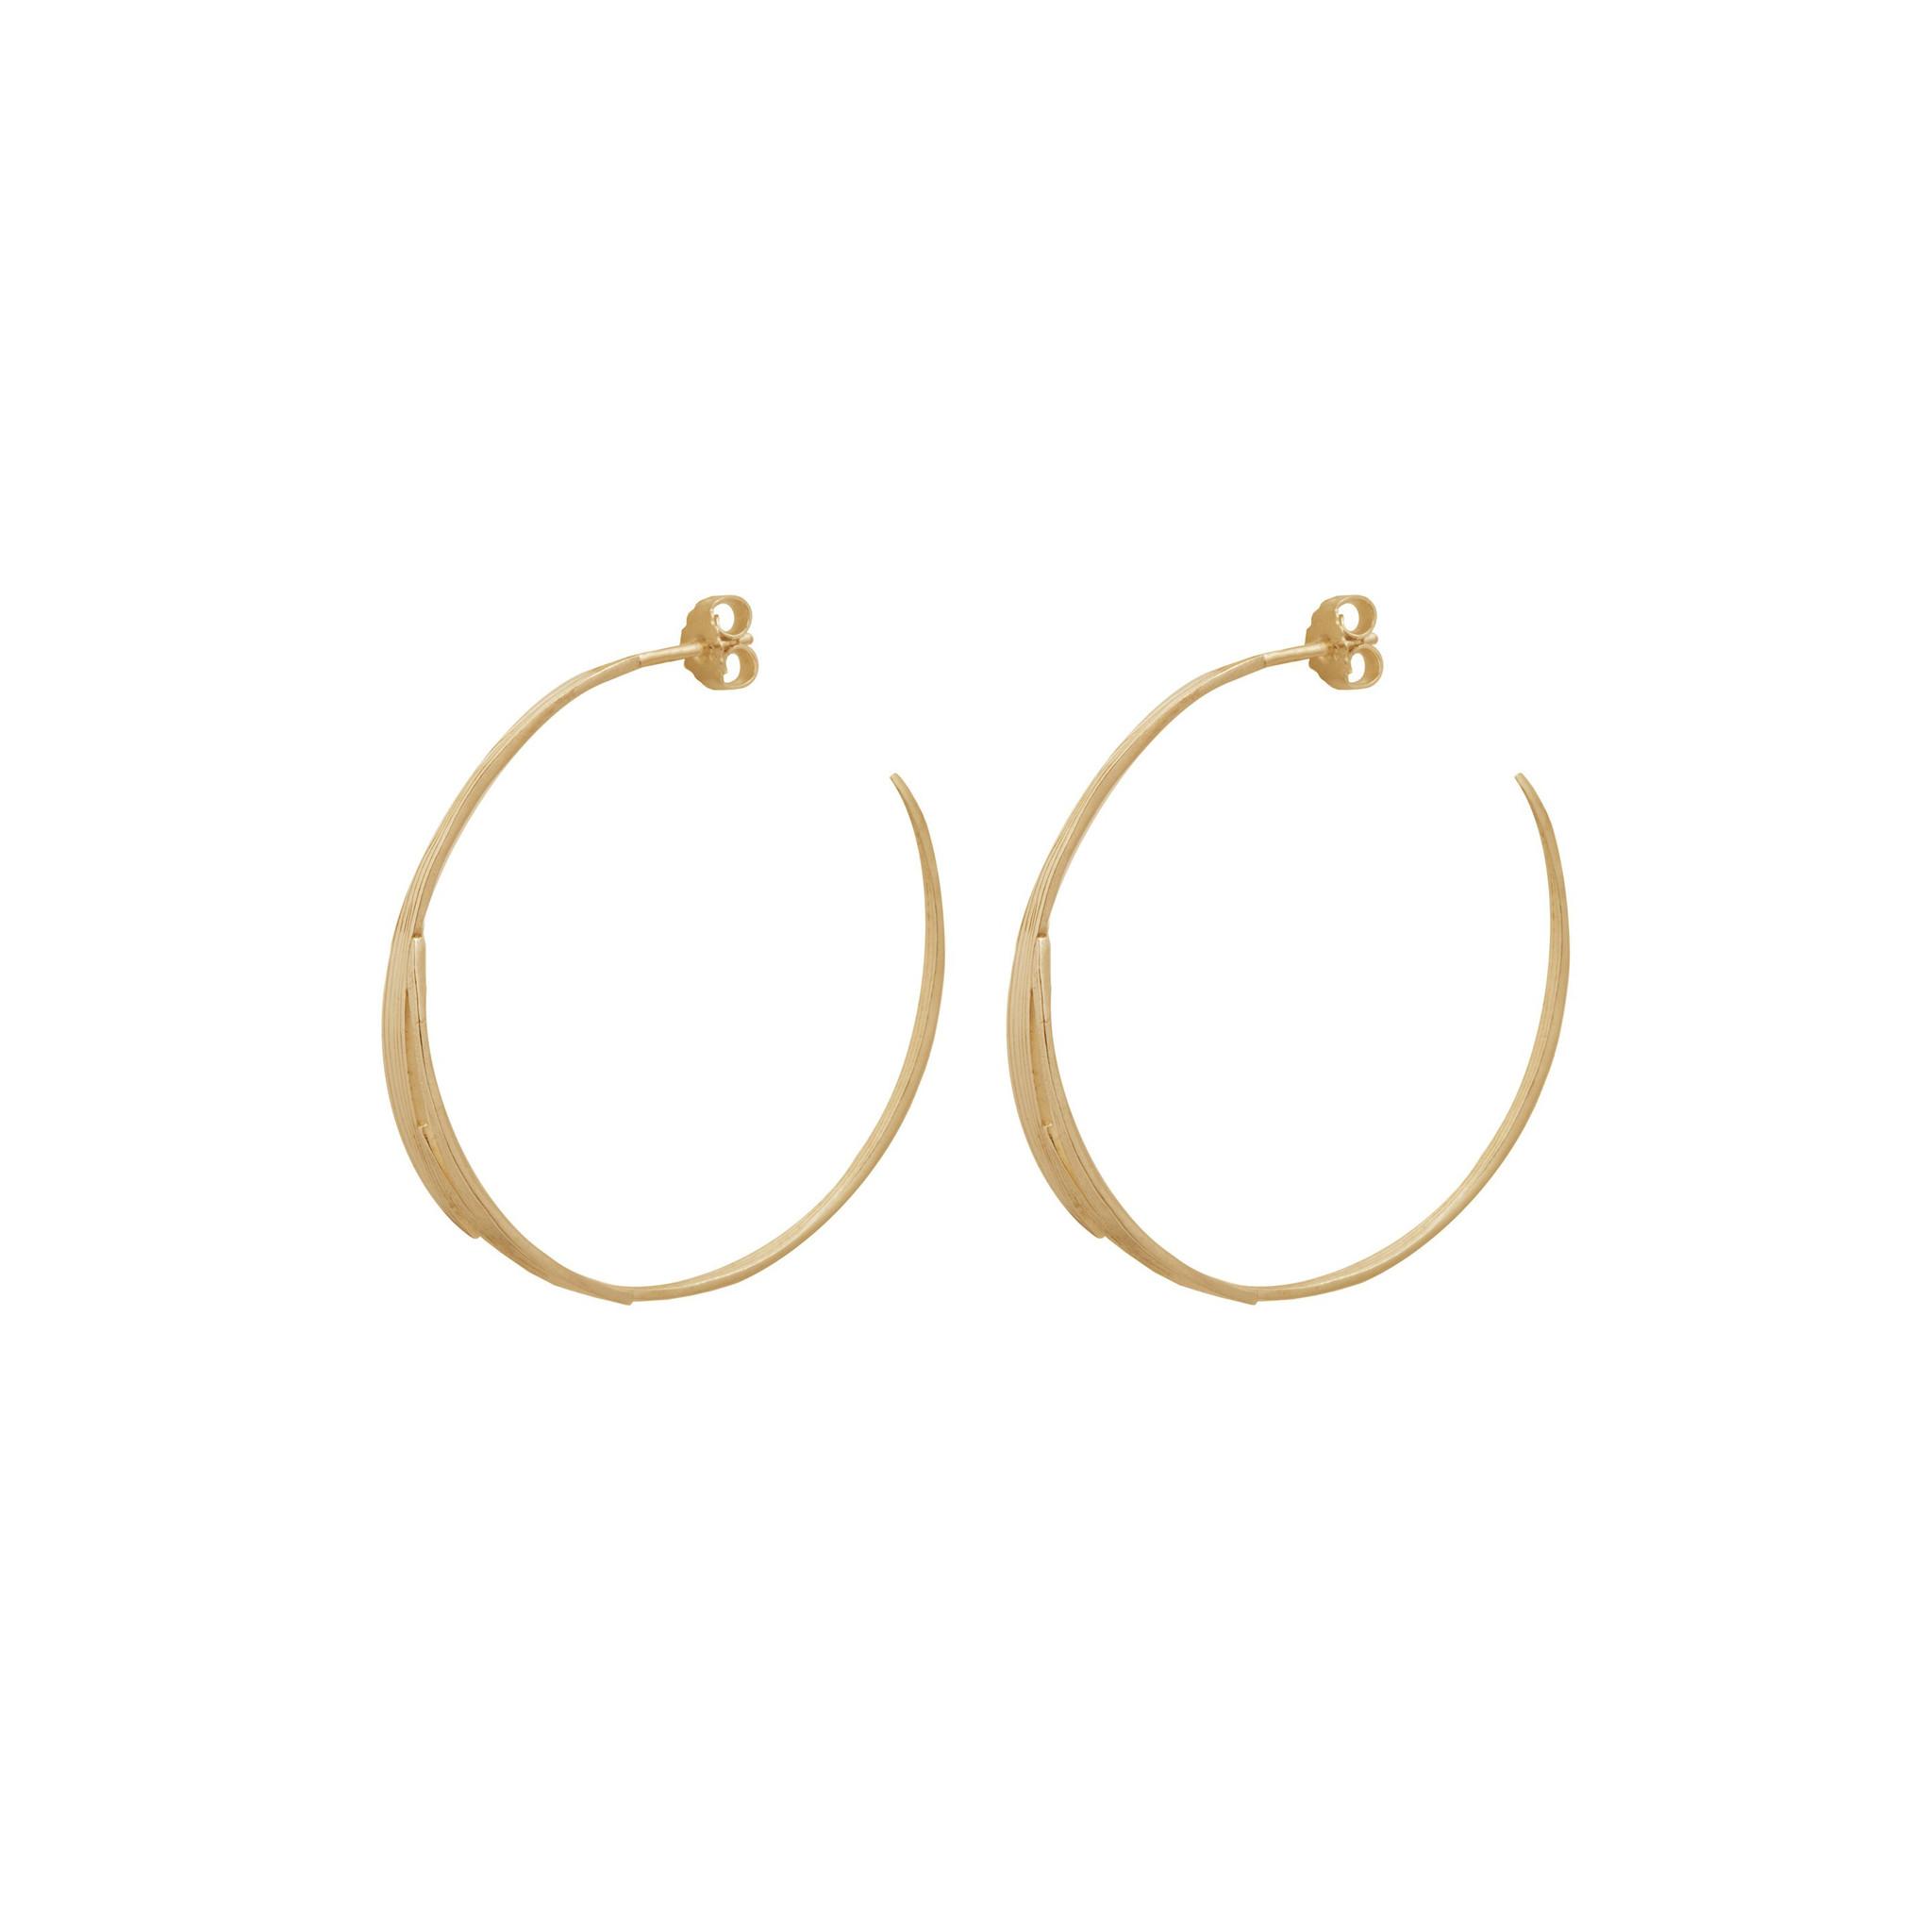 Bamboo leaves earrings Goldplated